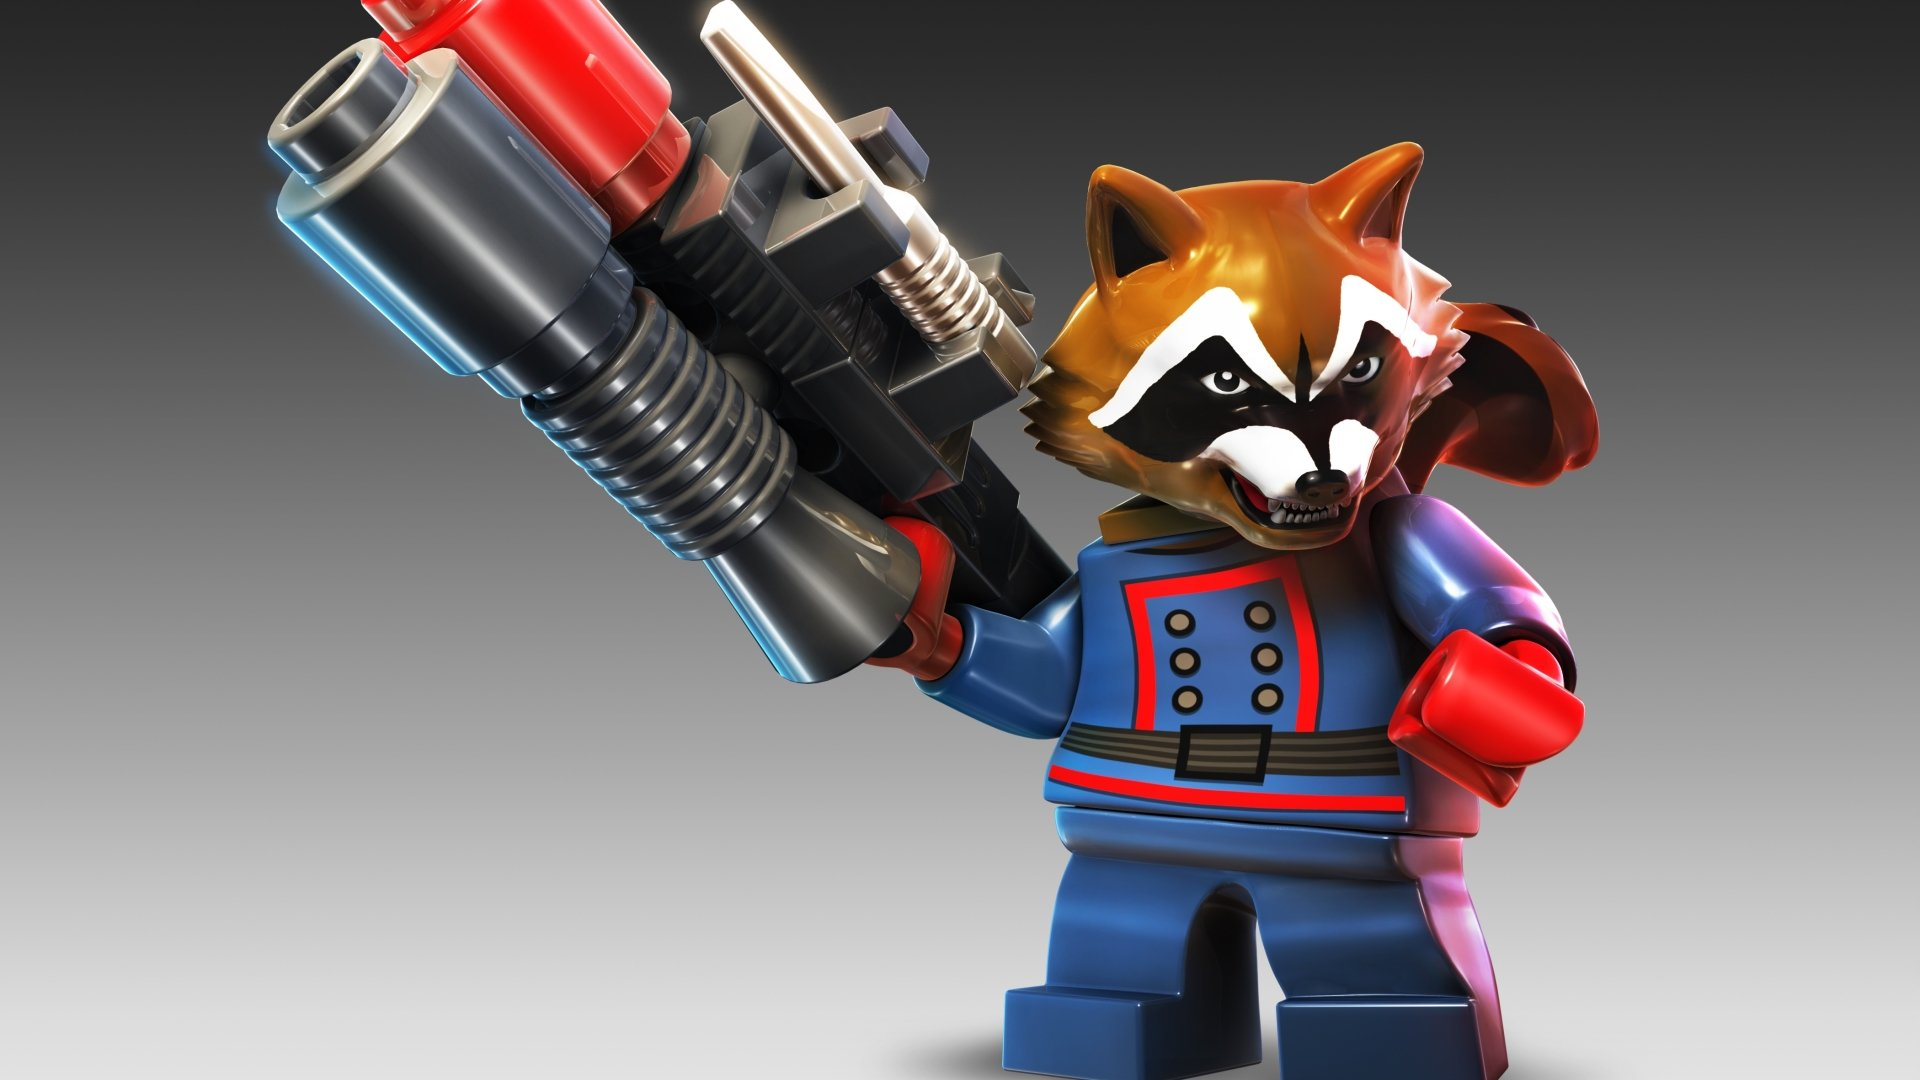 Video Game - LEGO Marvel Super Heroes  Rocket Raccoon Wallpaper